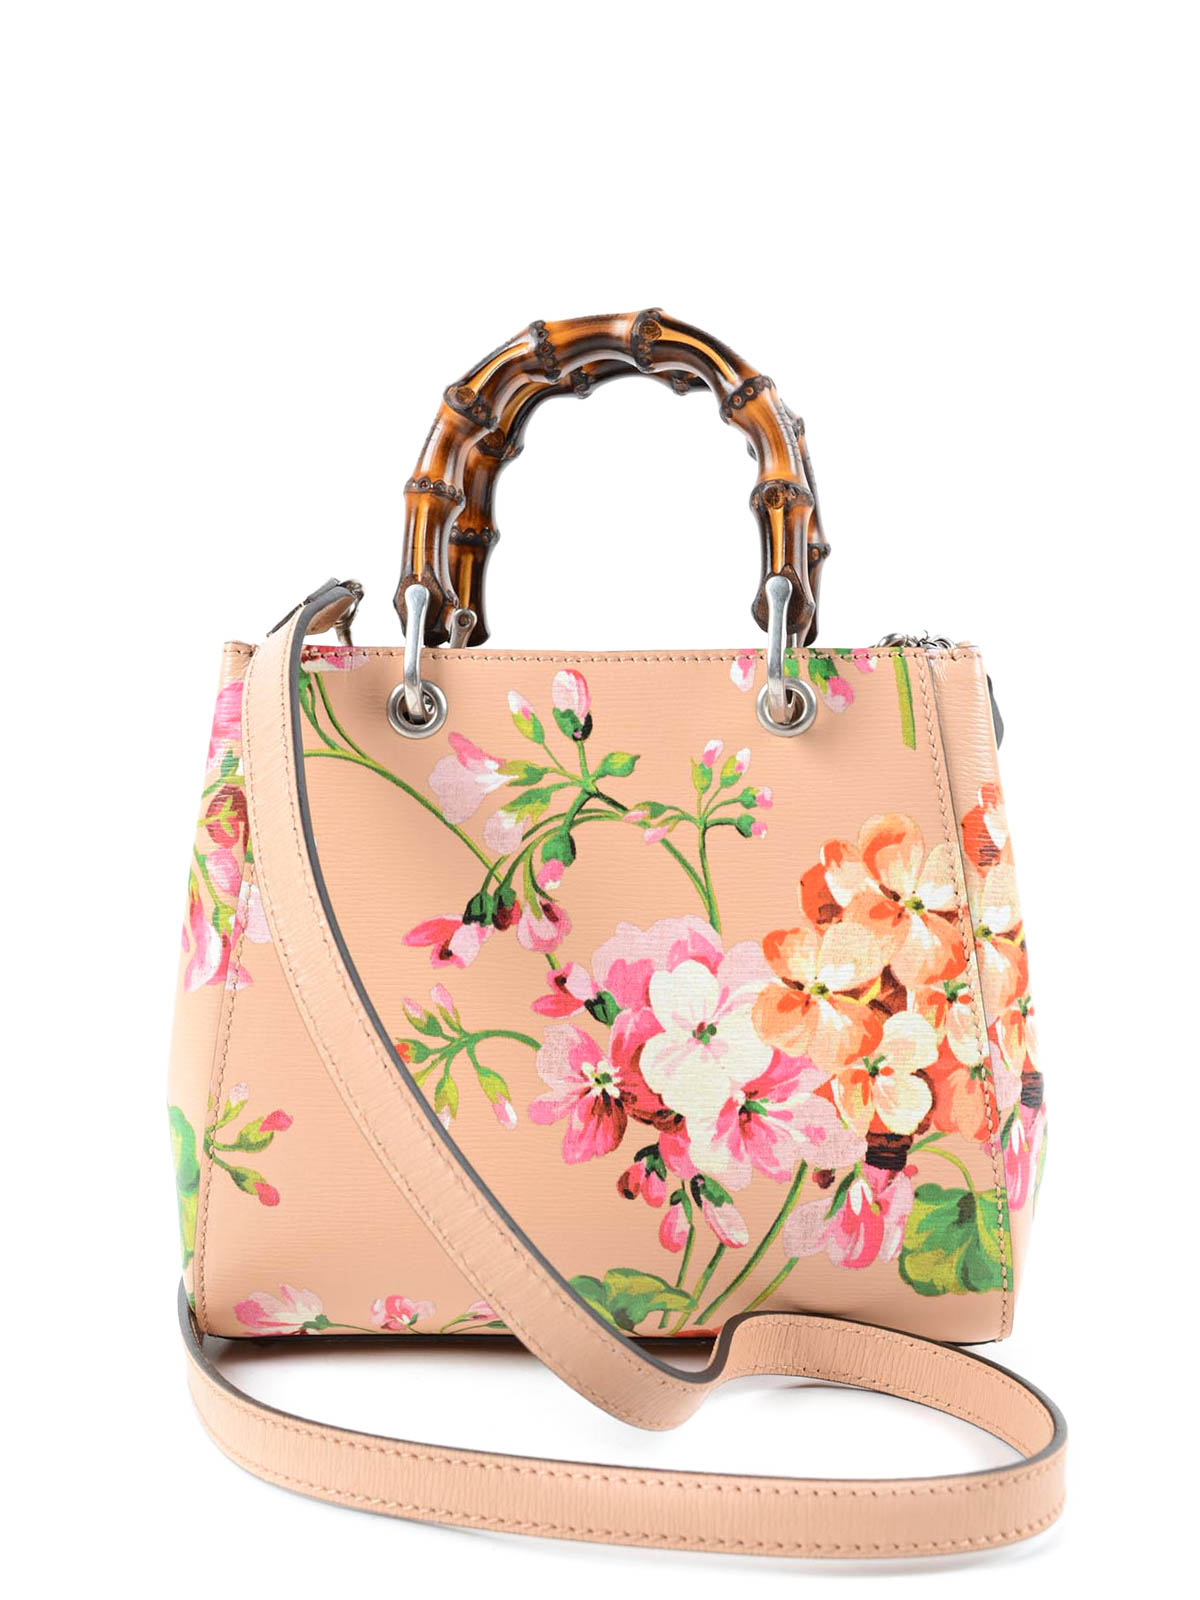 133d73619540 Gucci - Blooms bamboo mini shopper - cross body bags - 368823 CWB1N 5770